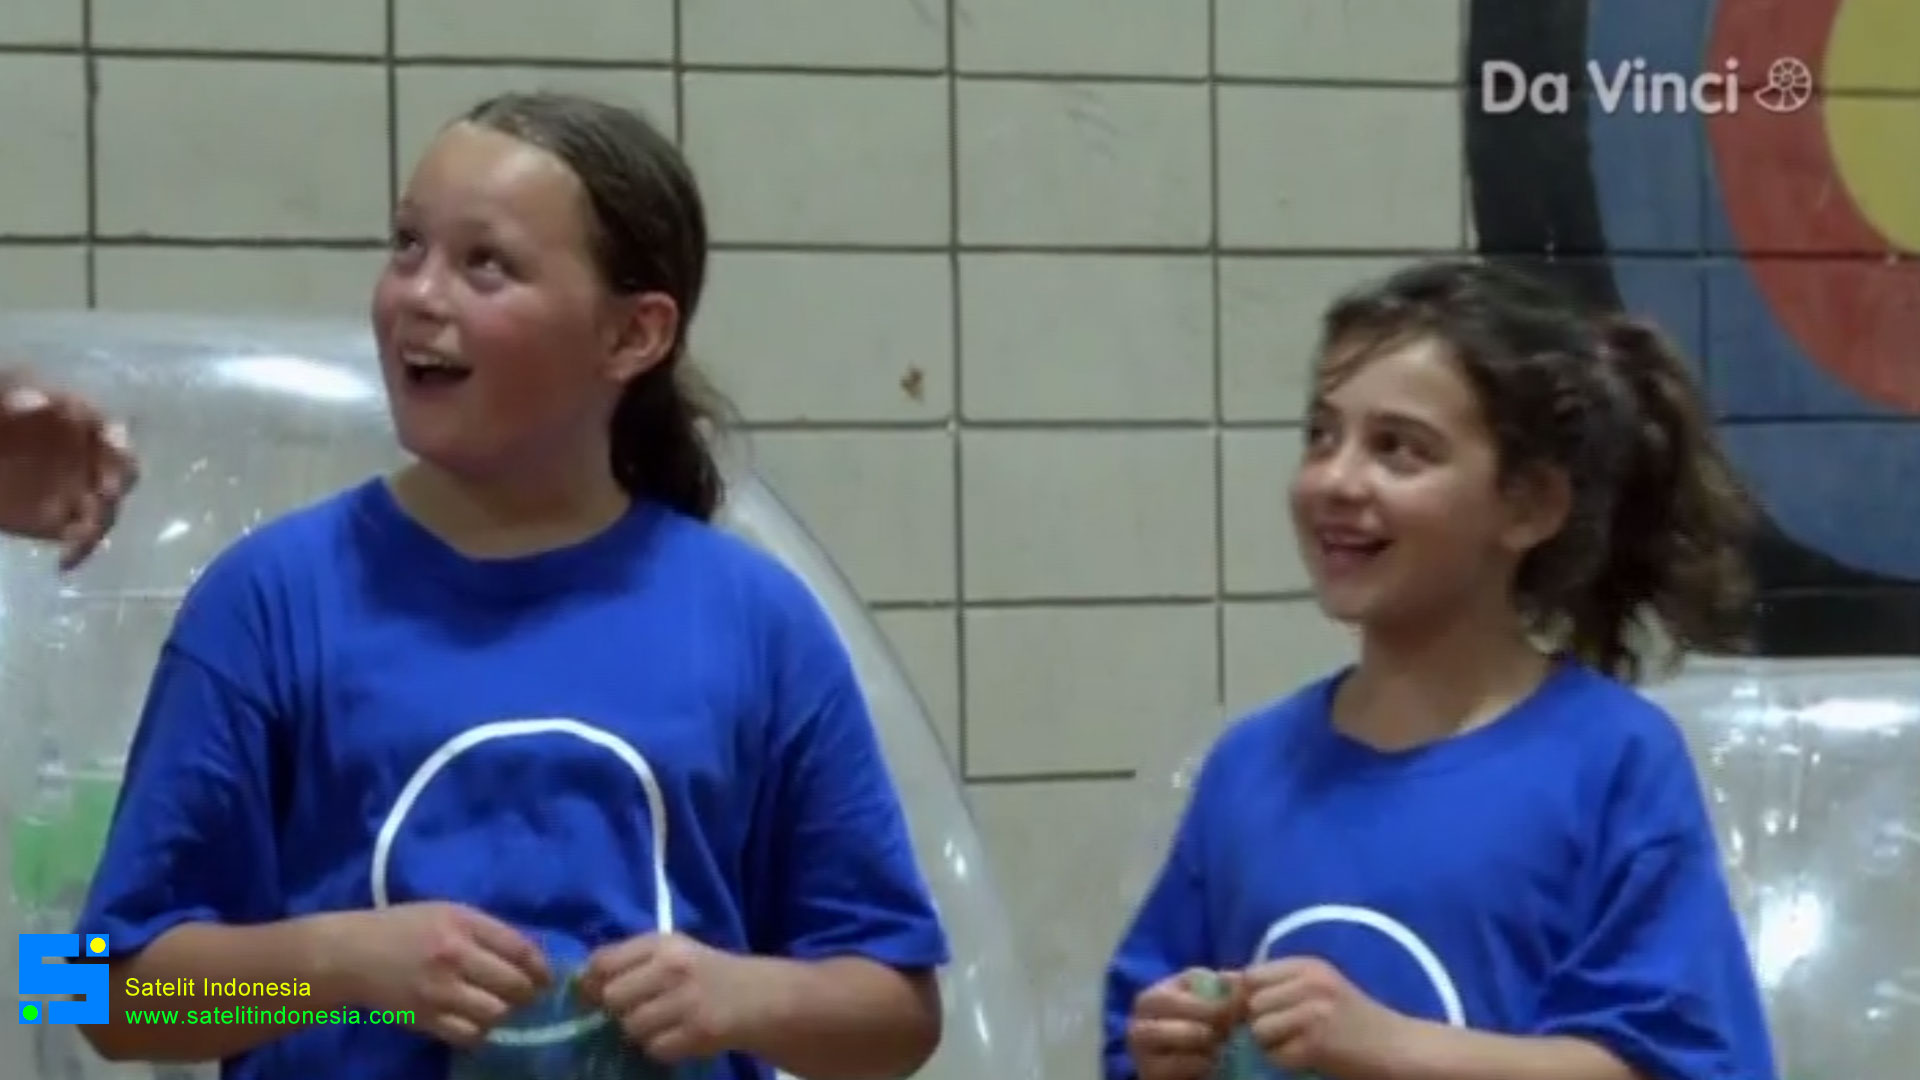 Frekuensi siaran Davinci Kids di satelit Palapa D Terbaru